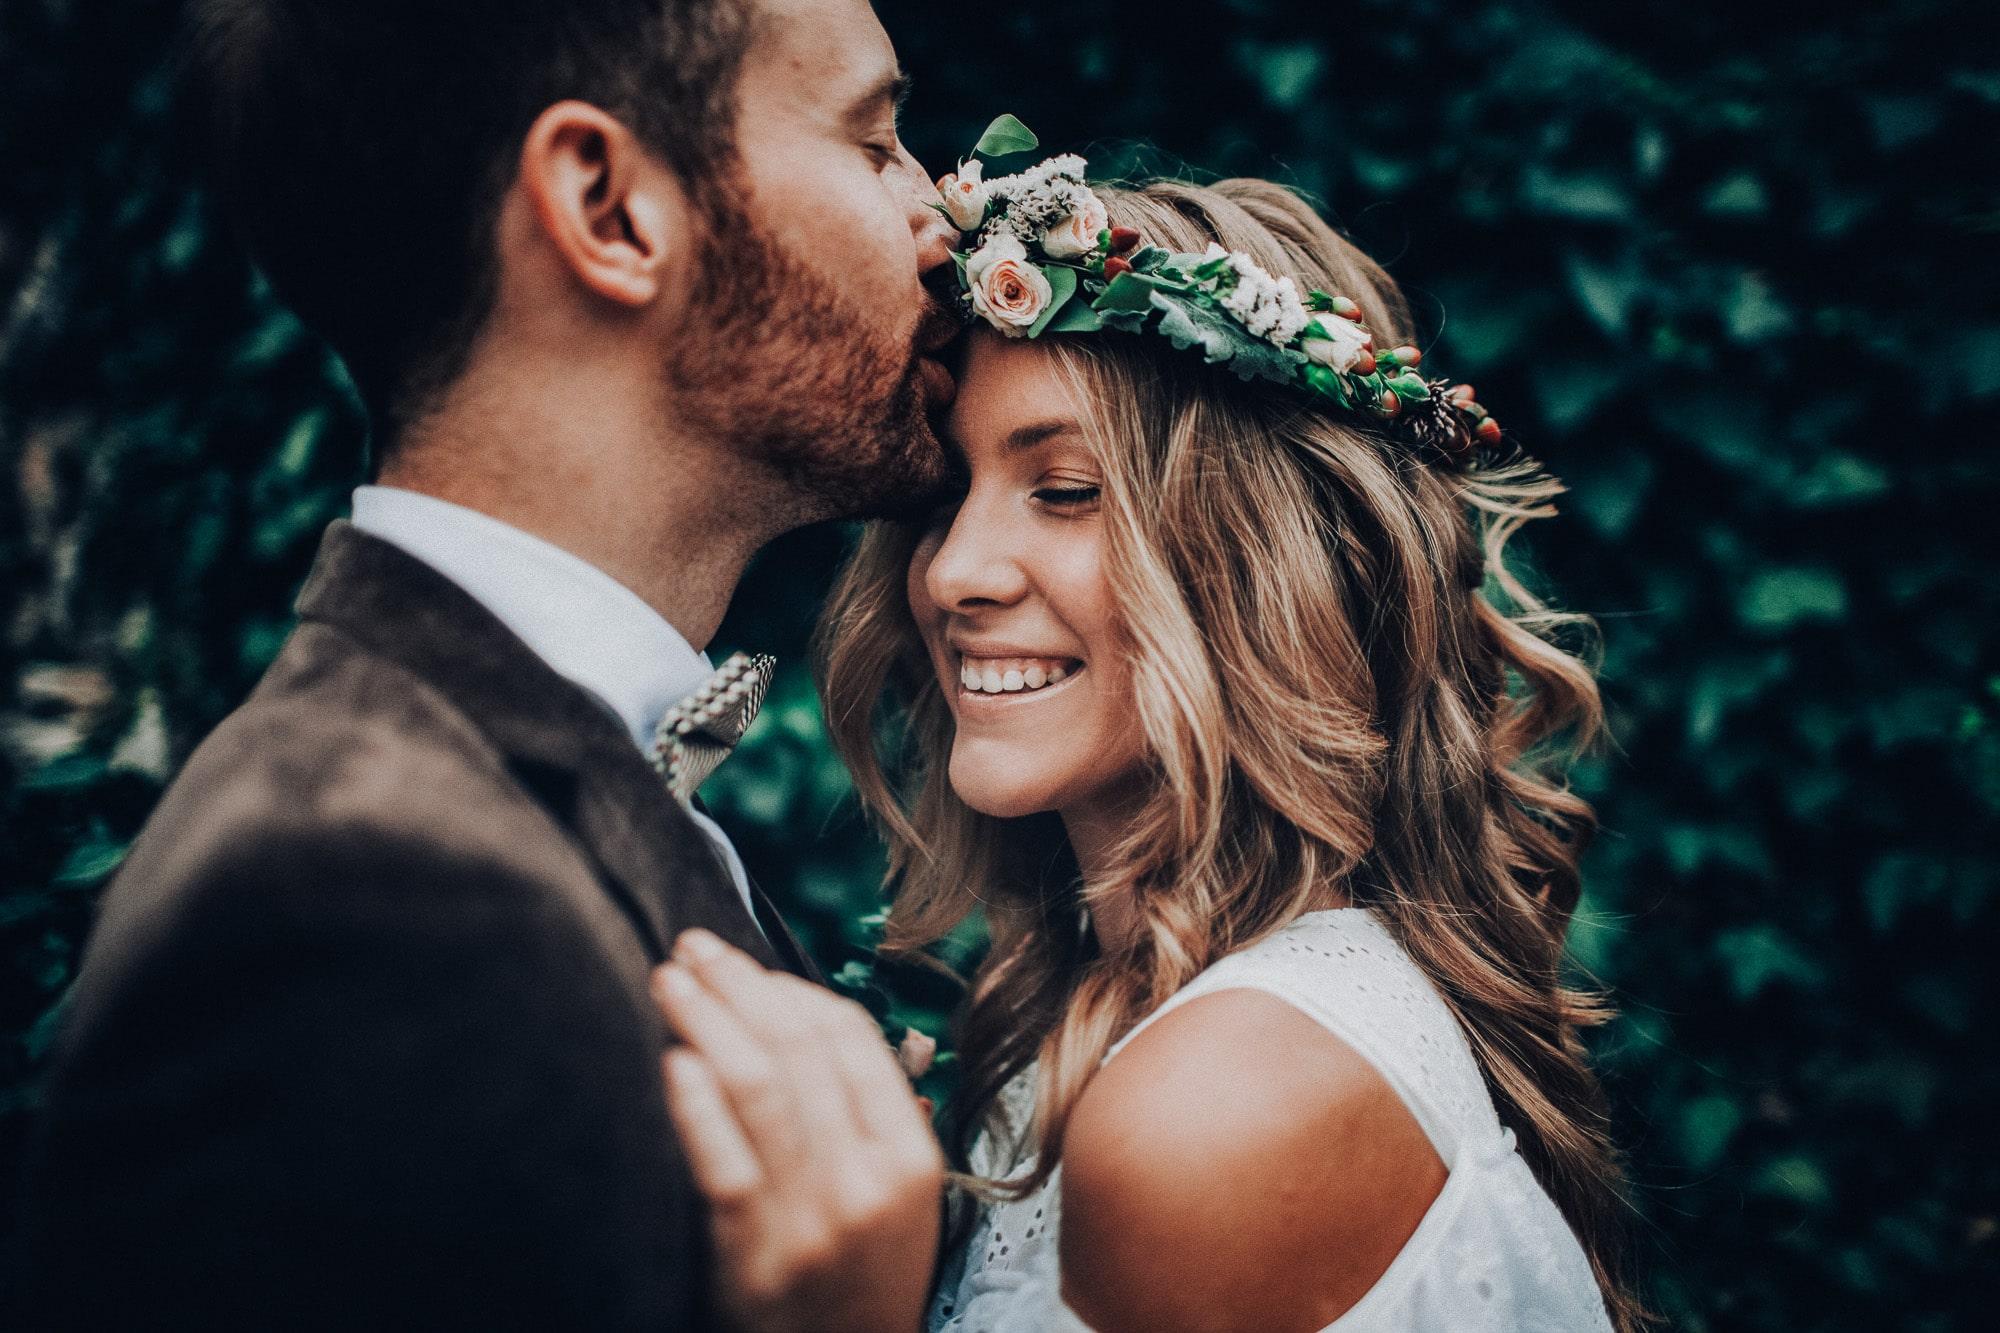 wedding etiquette, wedding photographer aylesbury, photographer aylesbury